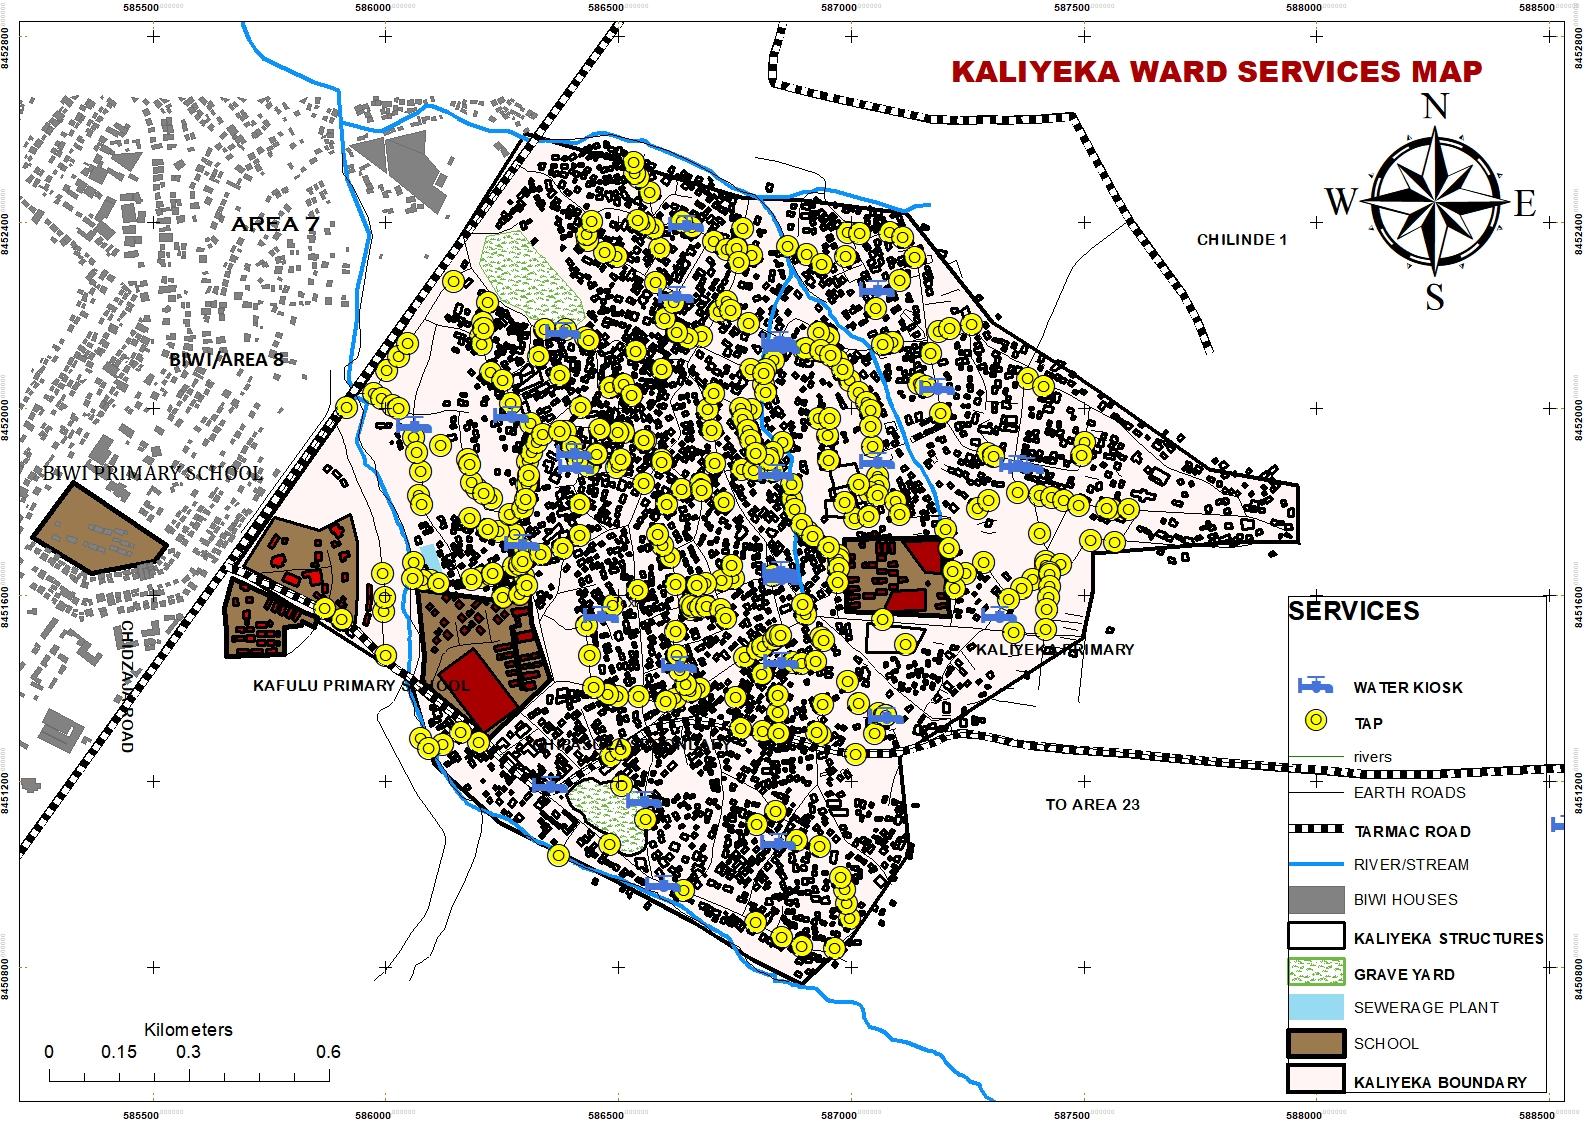 KALIYEKA SERVICES MAP-COVID-19